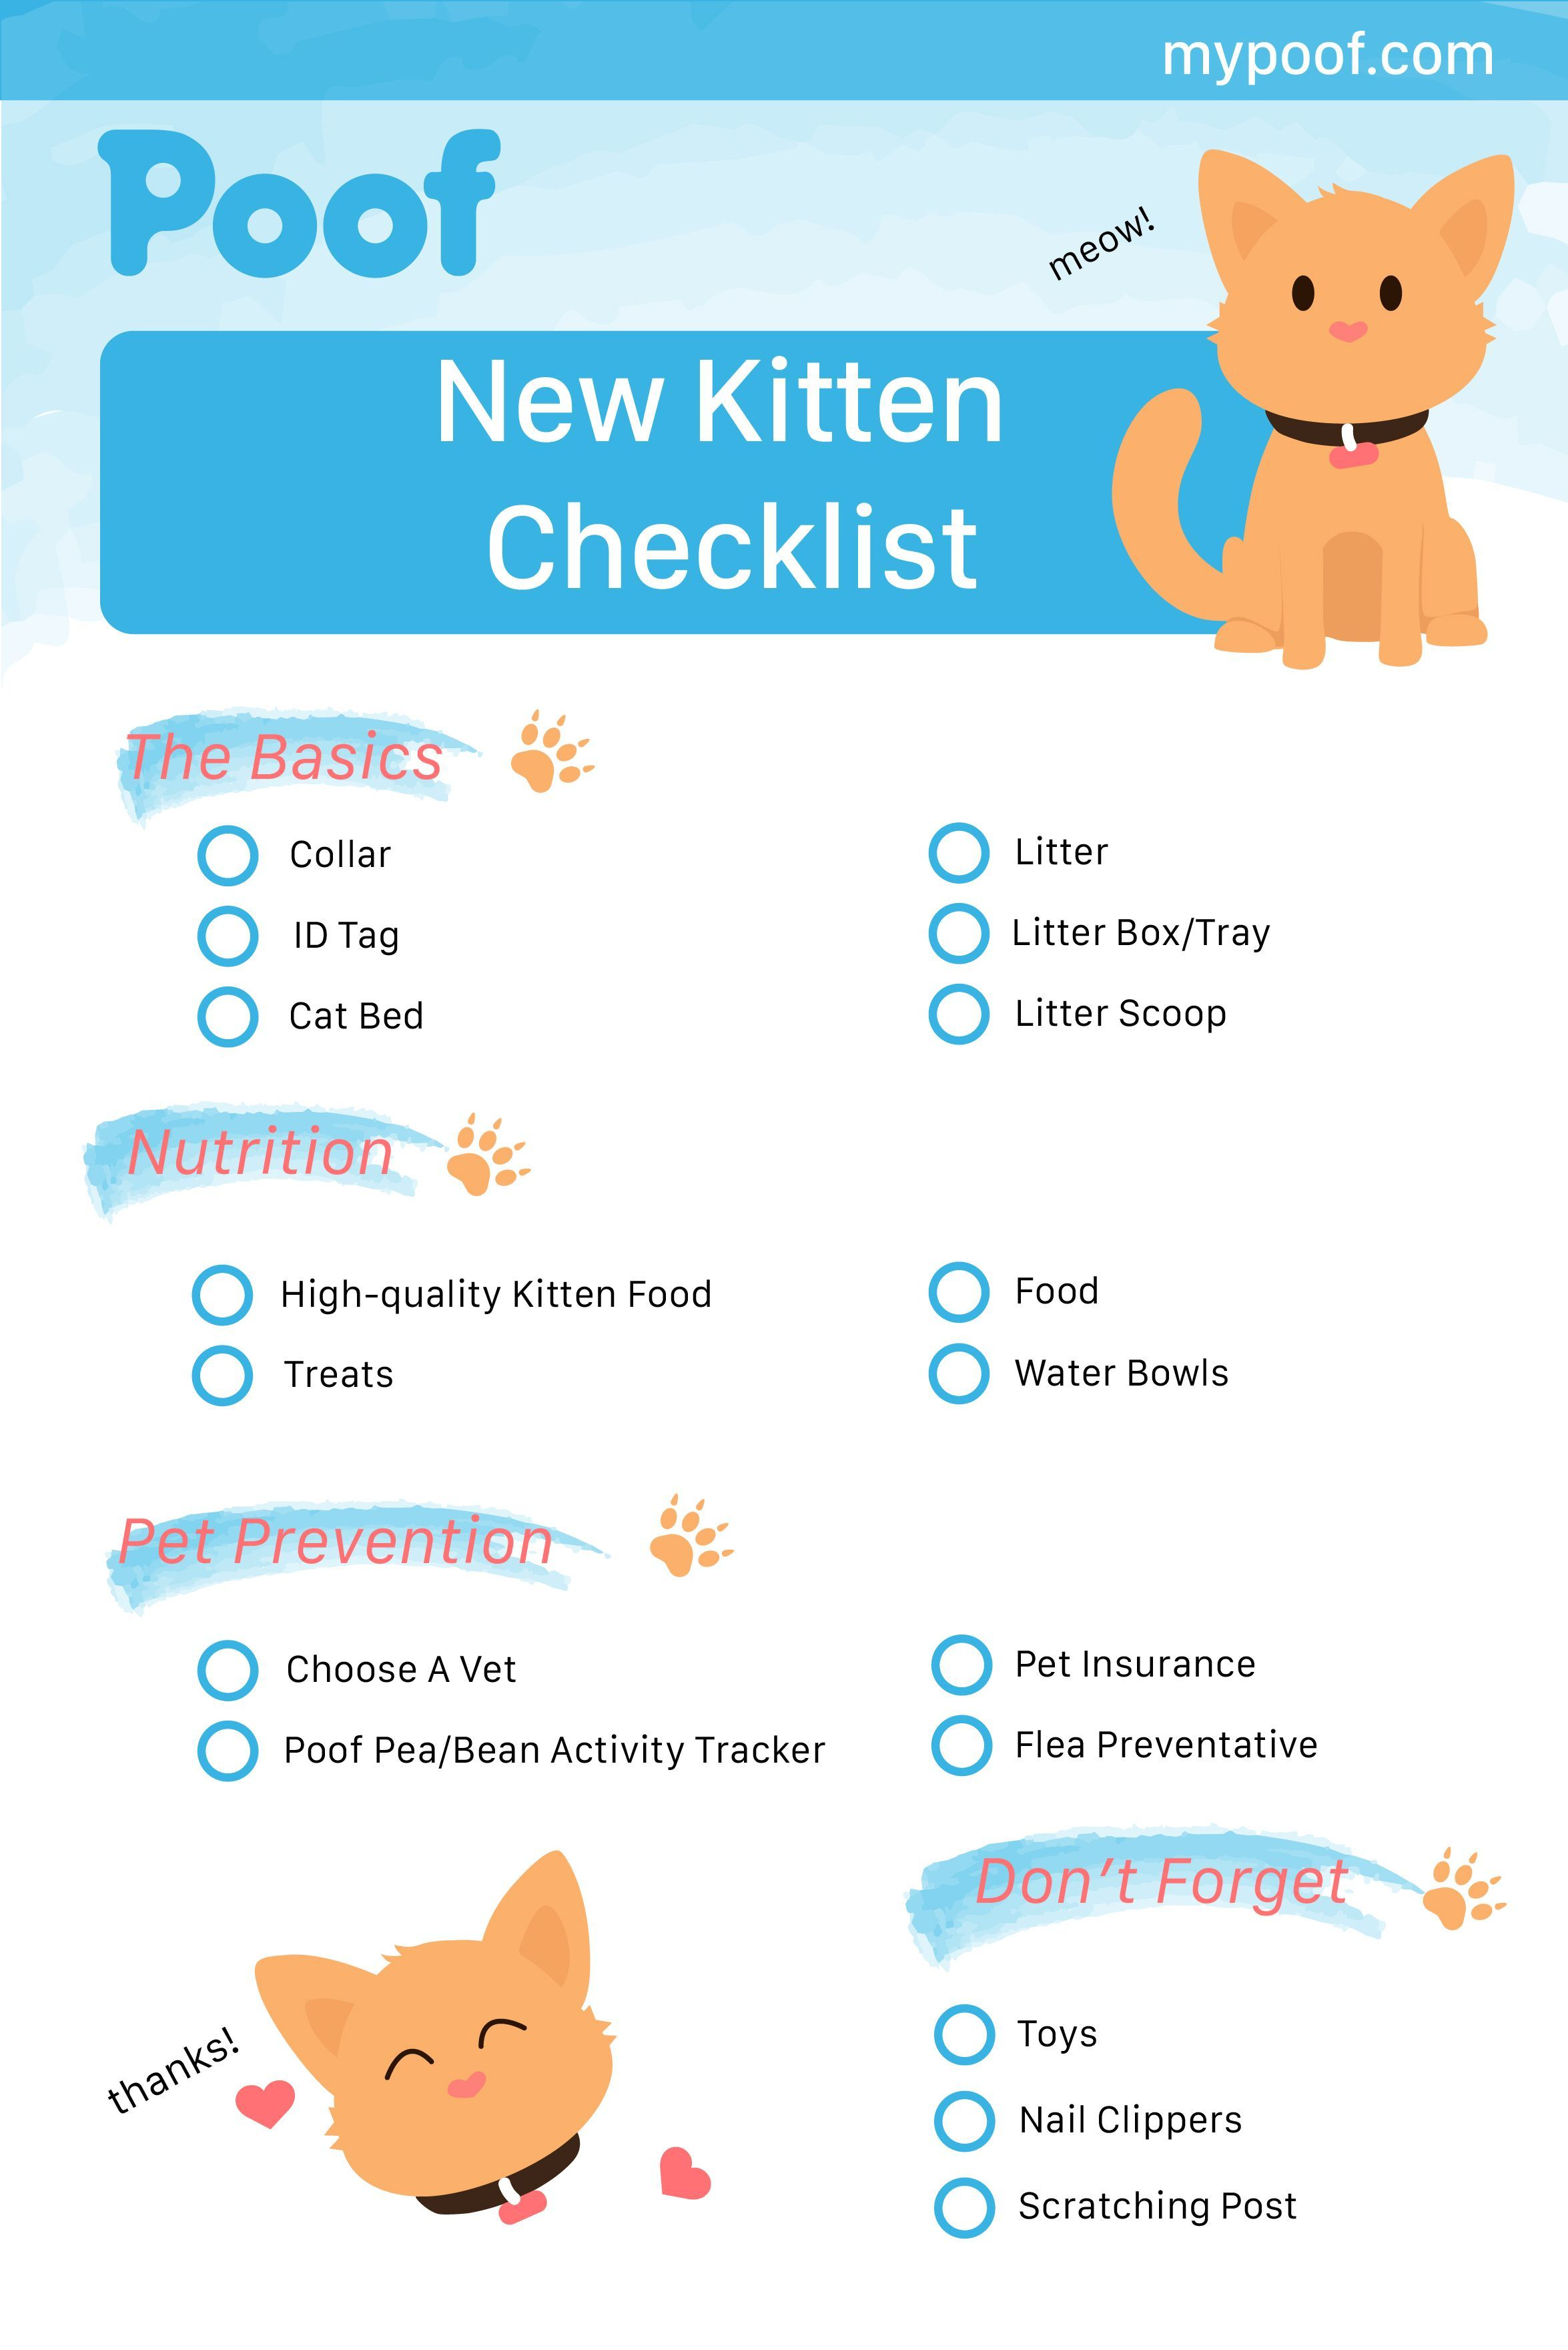 New Kitten Checklist Kittenchecklist Kittens Catscarechecklist Kitten Checklist Kitten Care Cat Care Tips